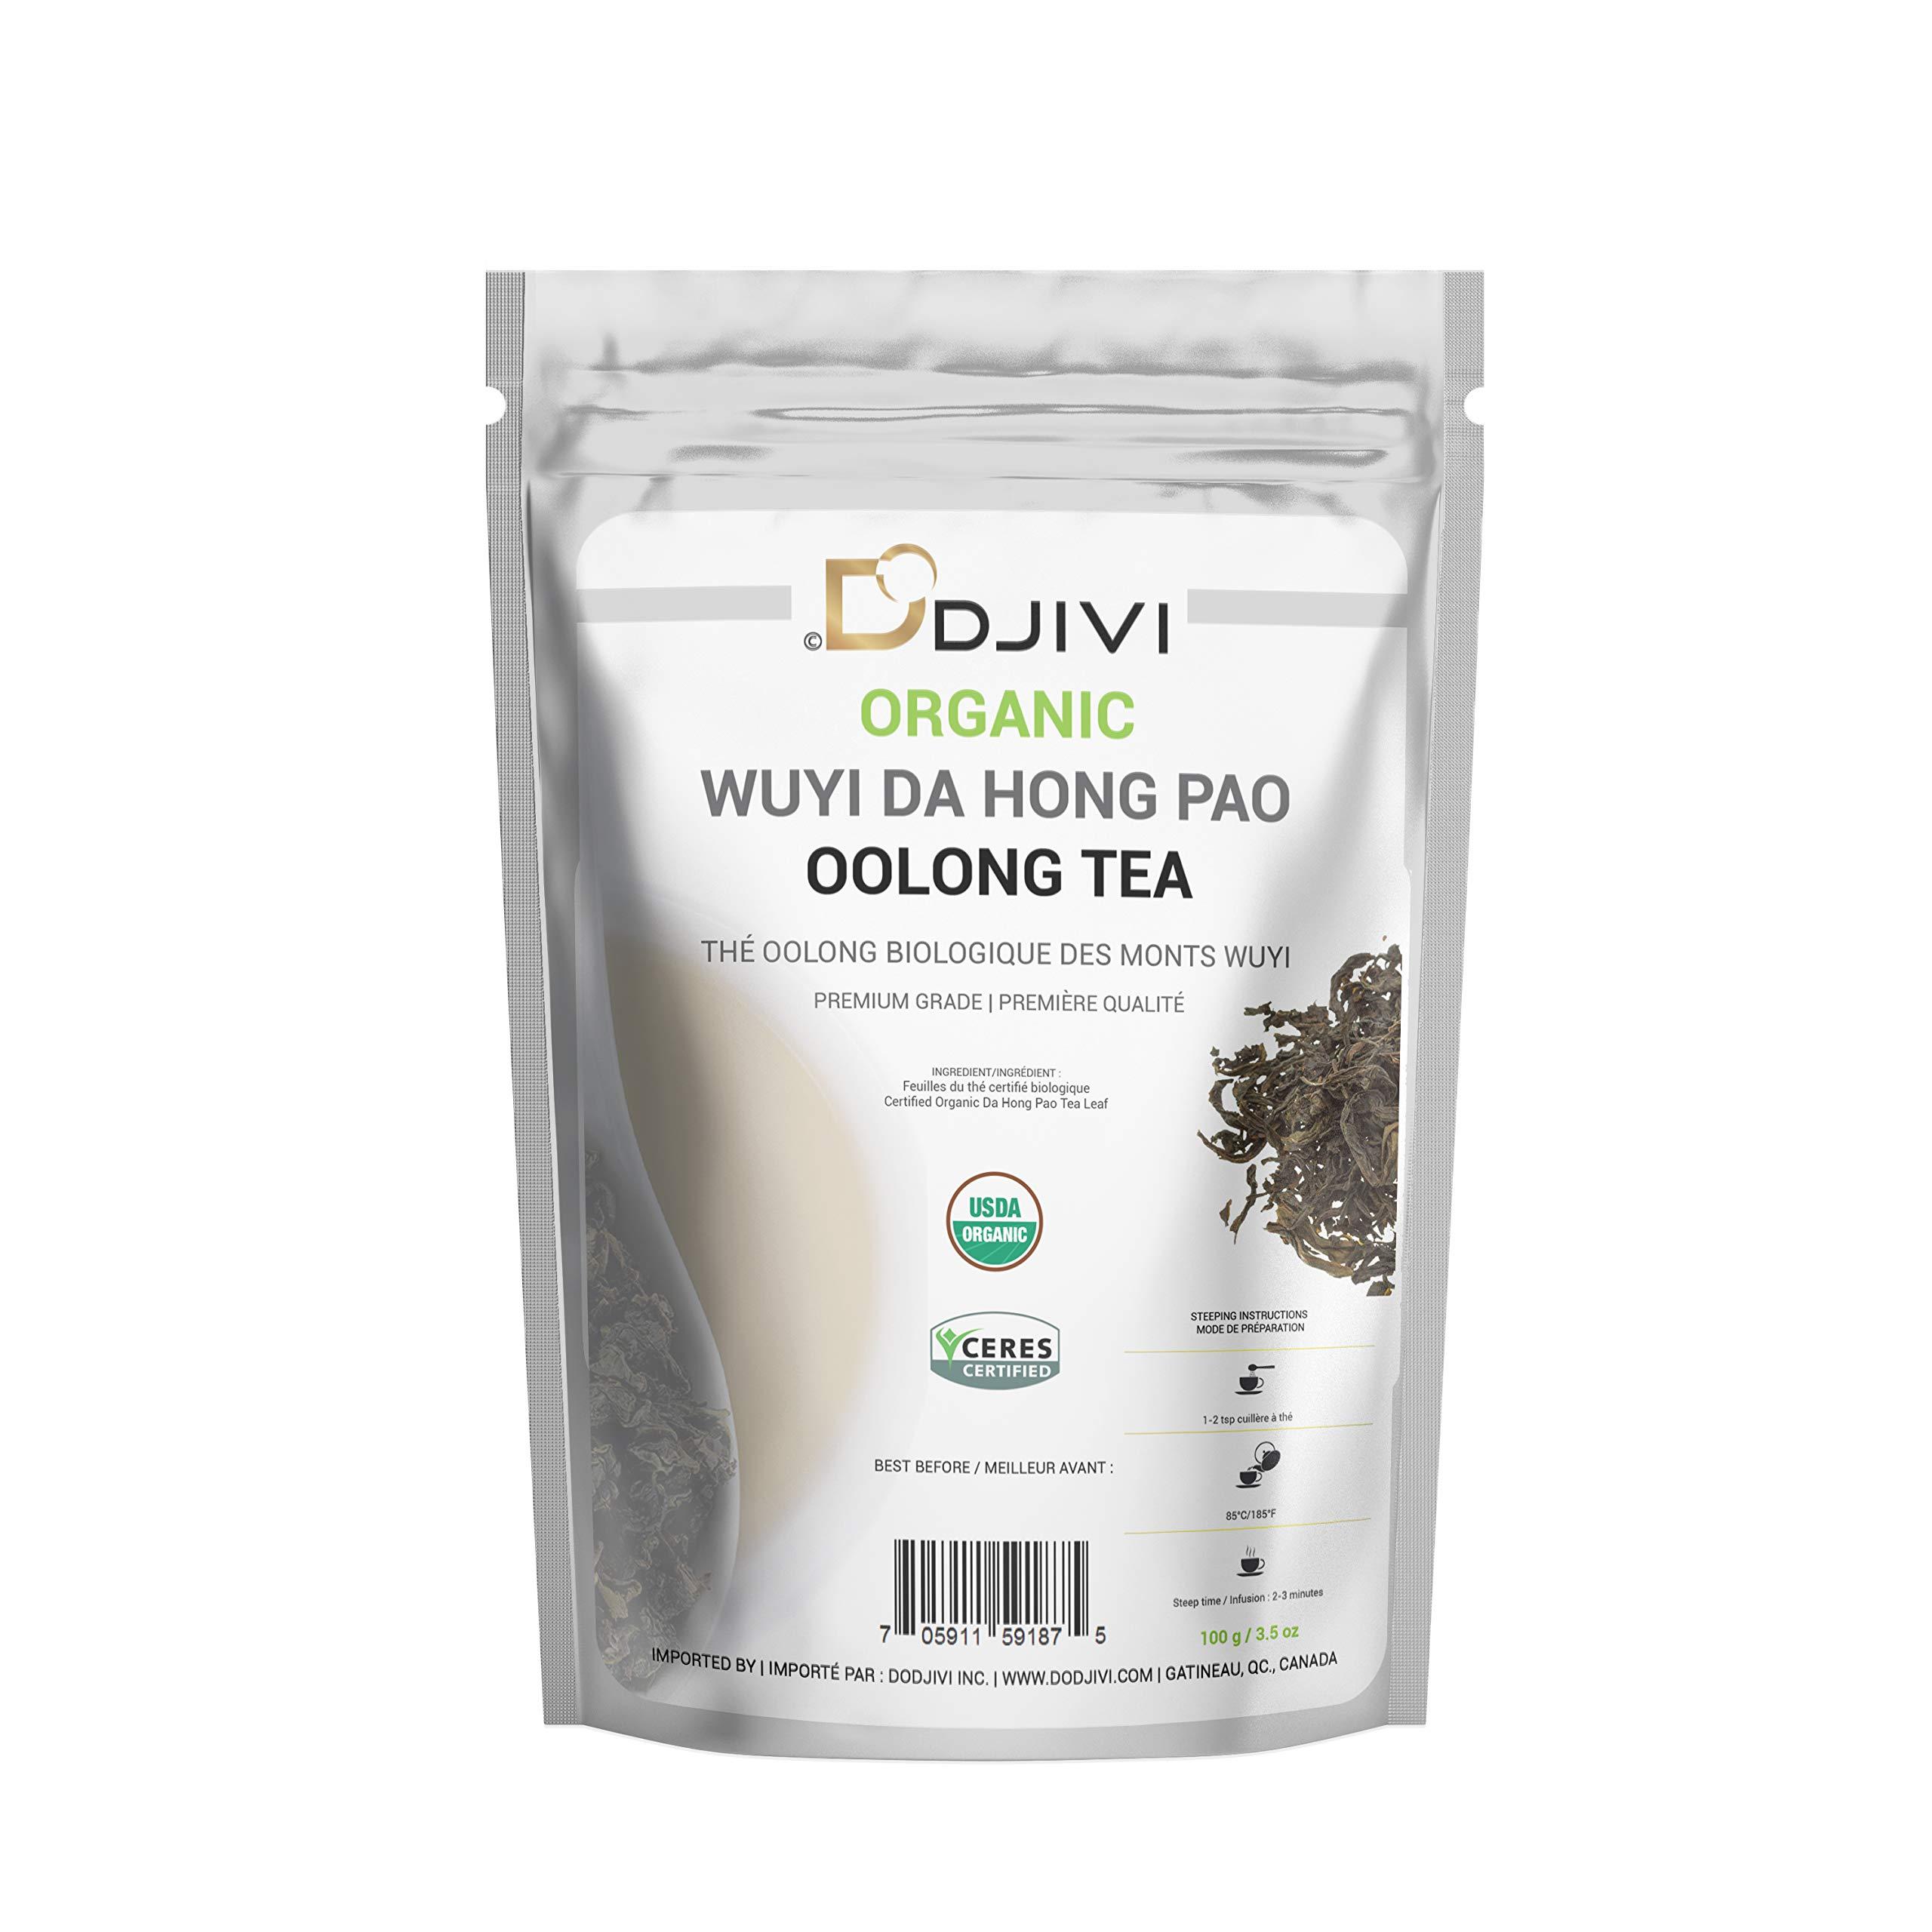 Dodjivi Organic Oolong Tea Organic Loose Leaf - Bulk Wuyi Mountain Da Hong Pao Tea – Big Red Robe Wu Long Tea - (100g/3.5 once)